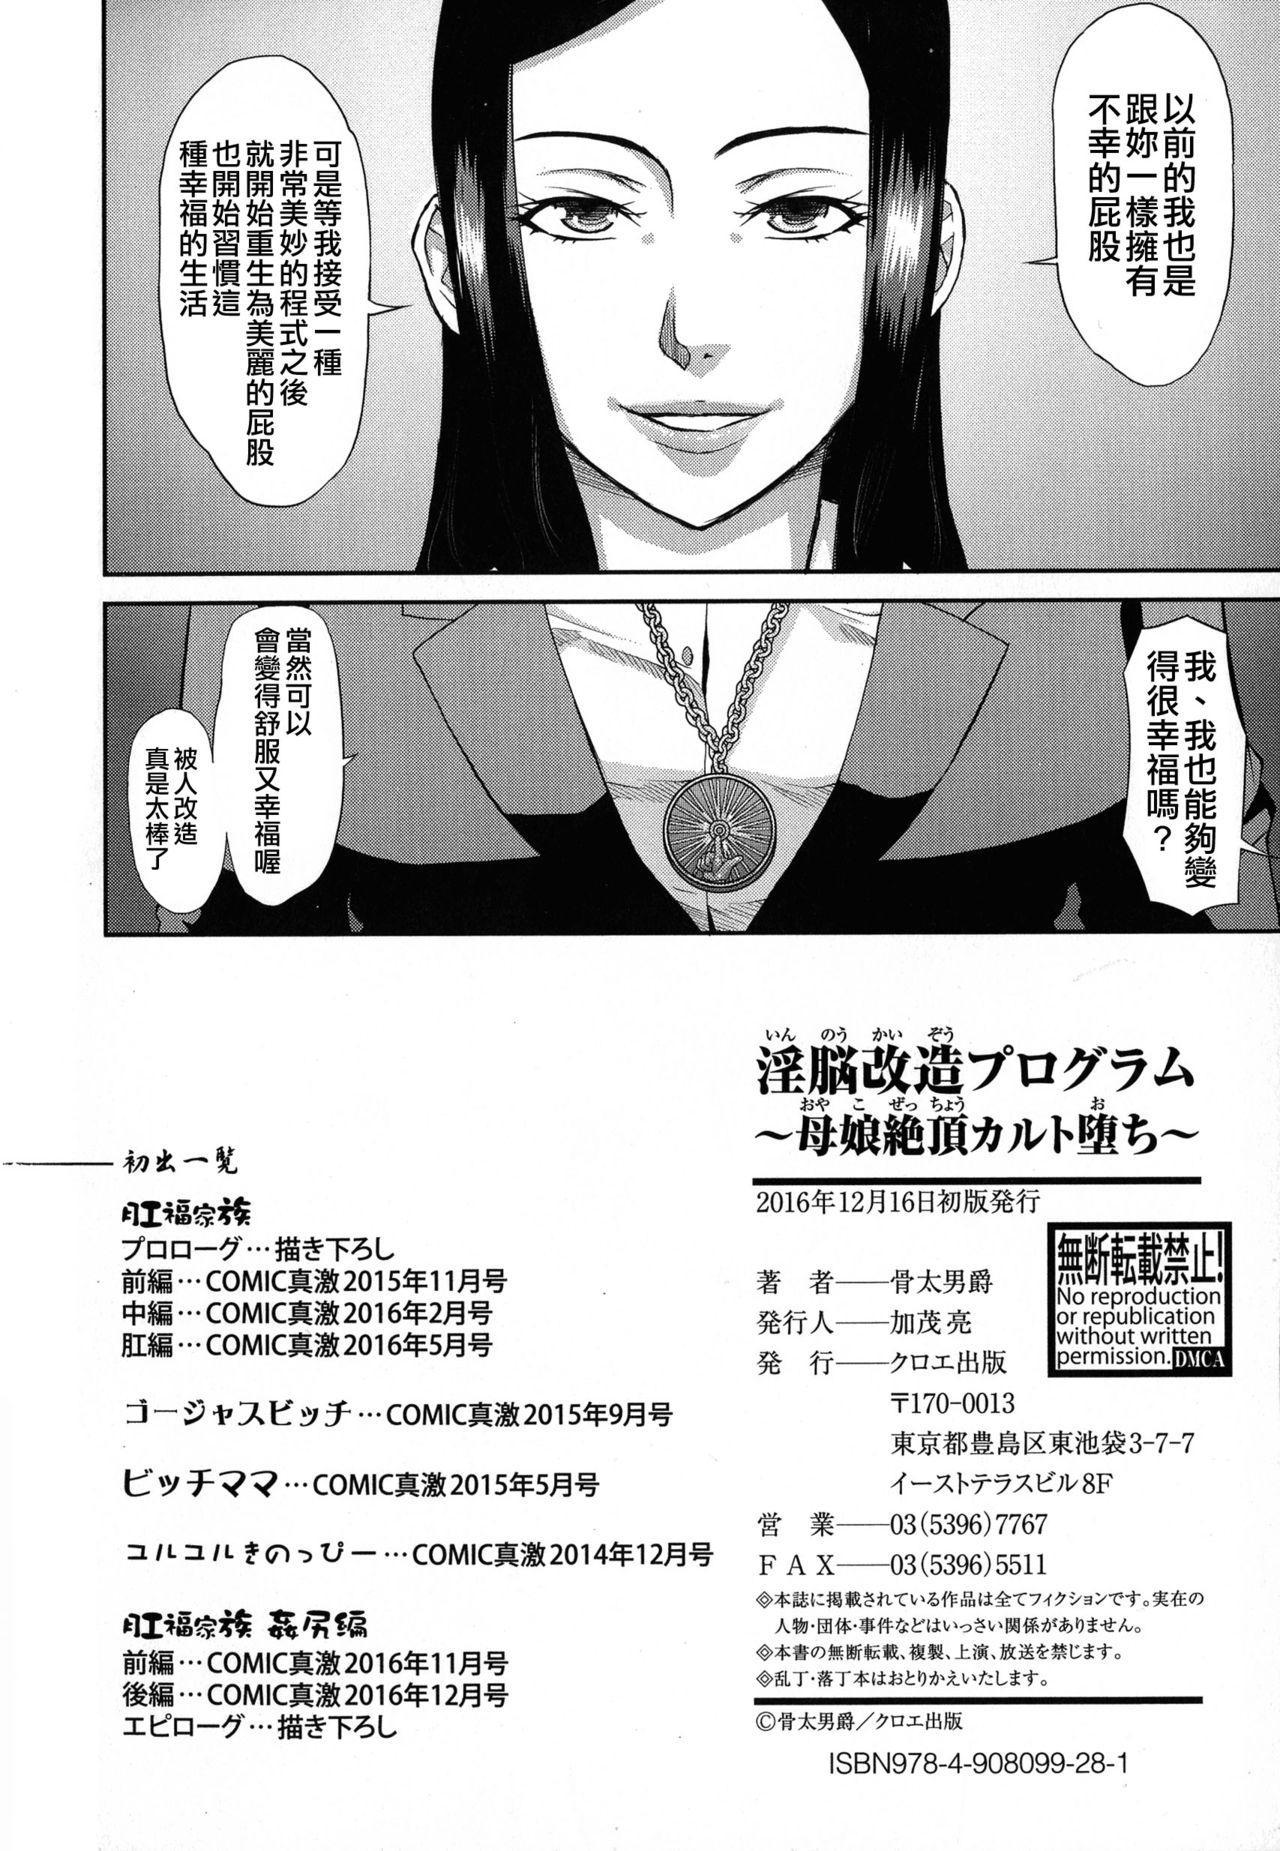 [Honebuto Danshaku] Innou Kaizou Program ~Oyako Zecchou Cult Ochi~ [Chinese]【不想记名重嵌--高质量图源】 232